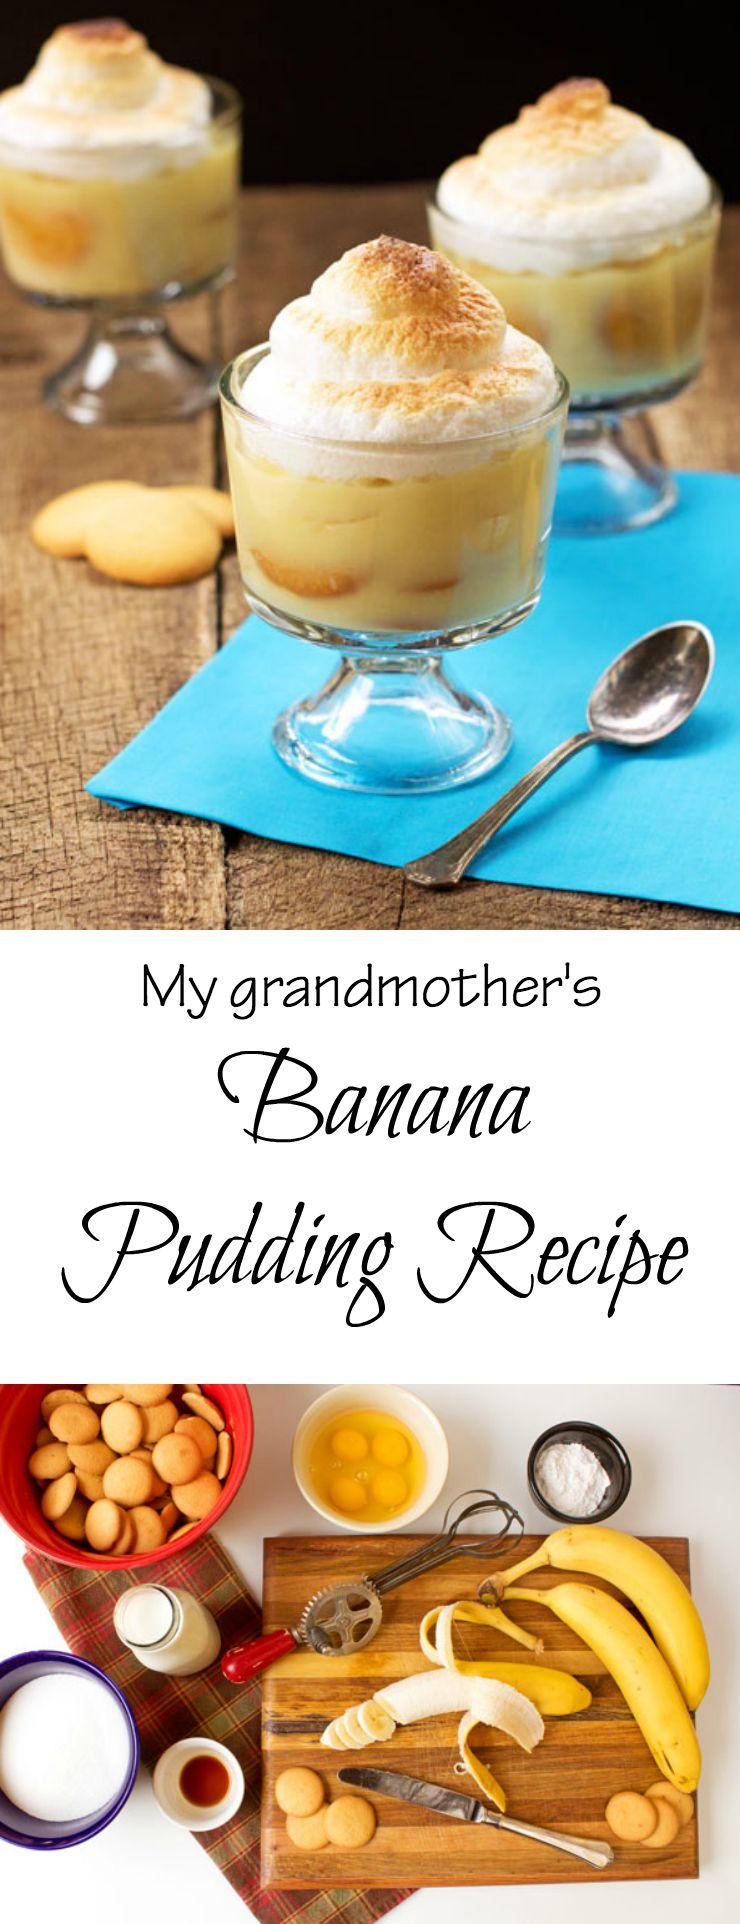 Banana Pudding Recipe   The Bearfoot Baker